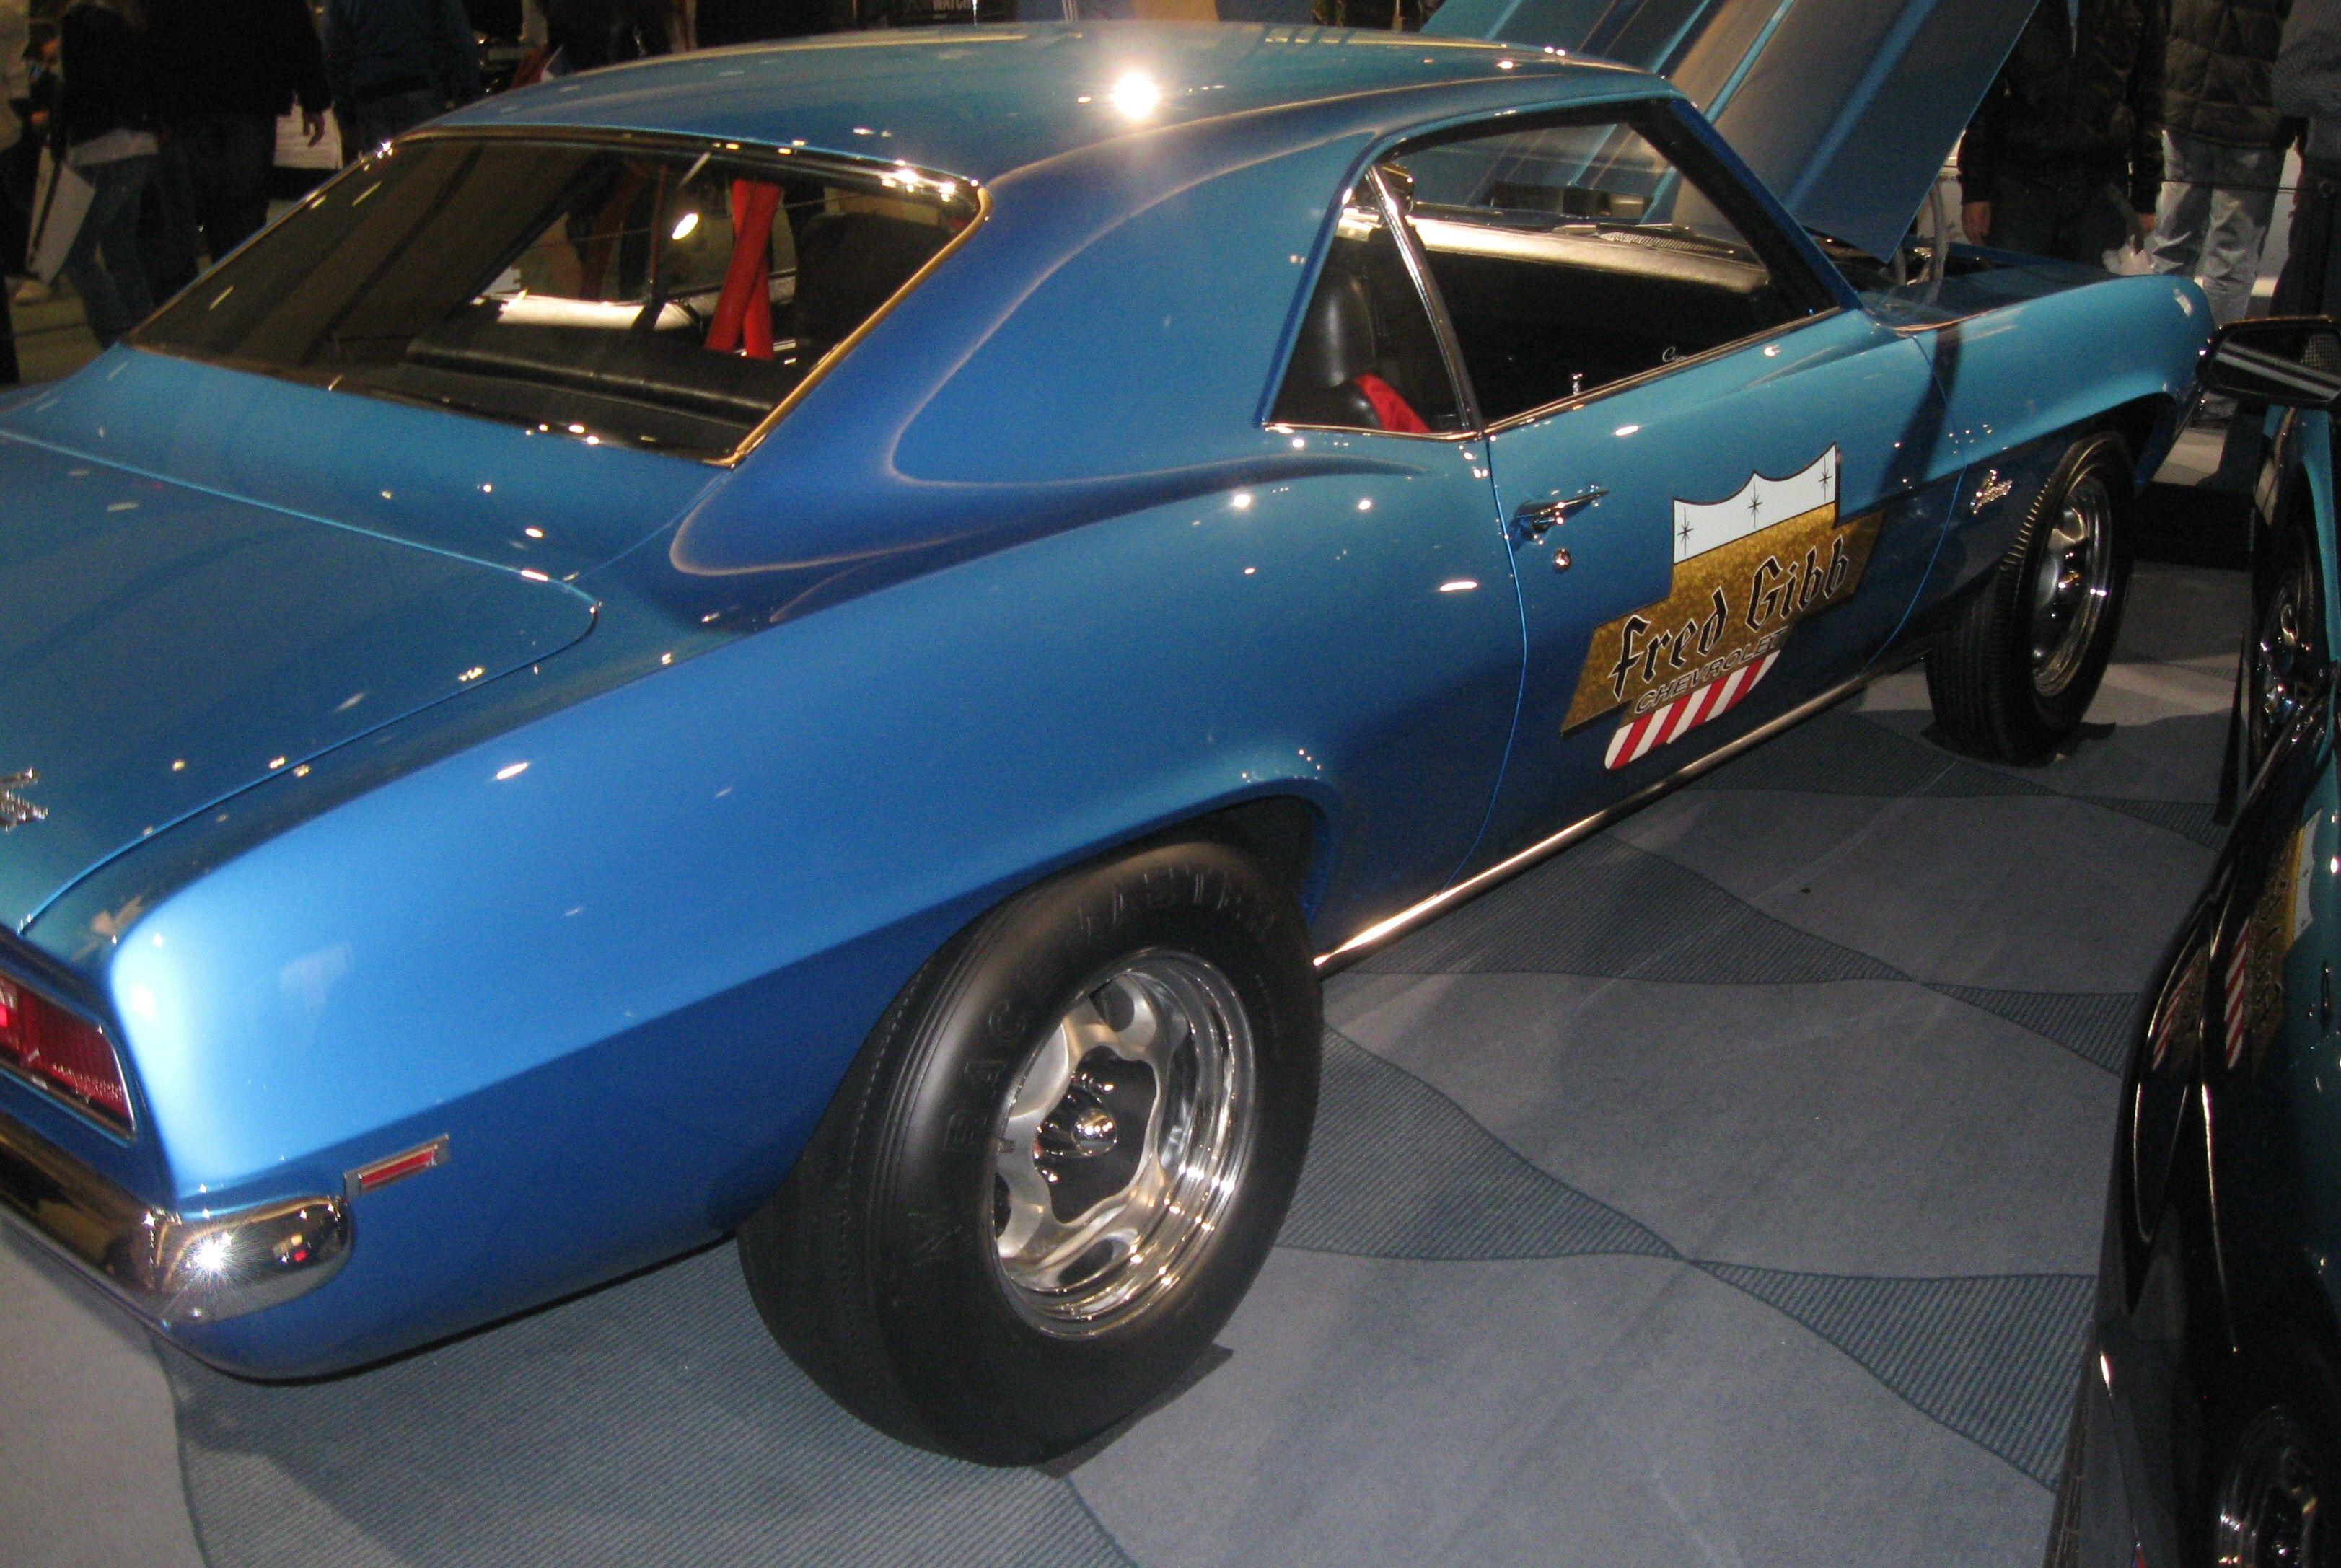 Vintage Camaro 427 drag car. http://musclecarfuturefortune.com/